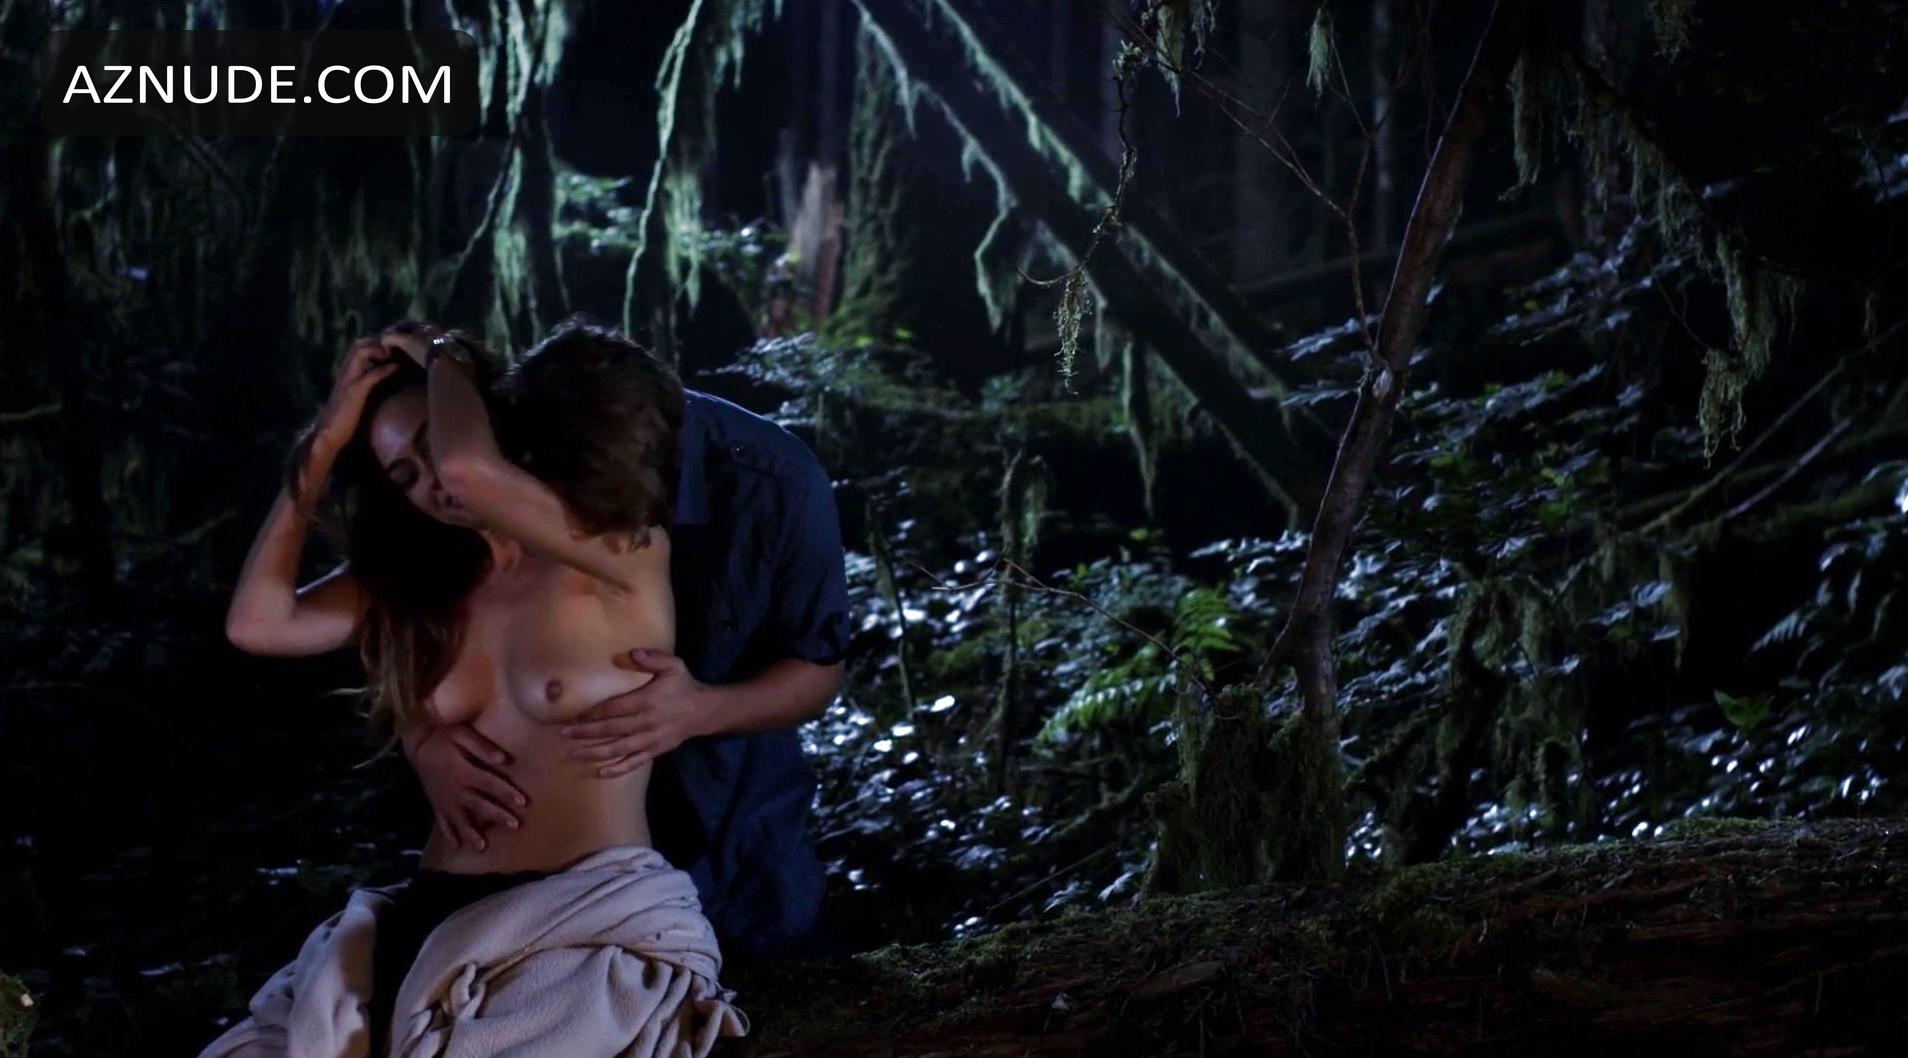 Sharon hinnendael nude embrace of the vampire 2013 - 2 part 8